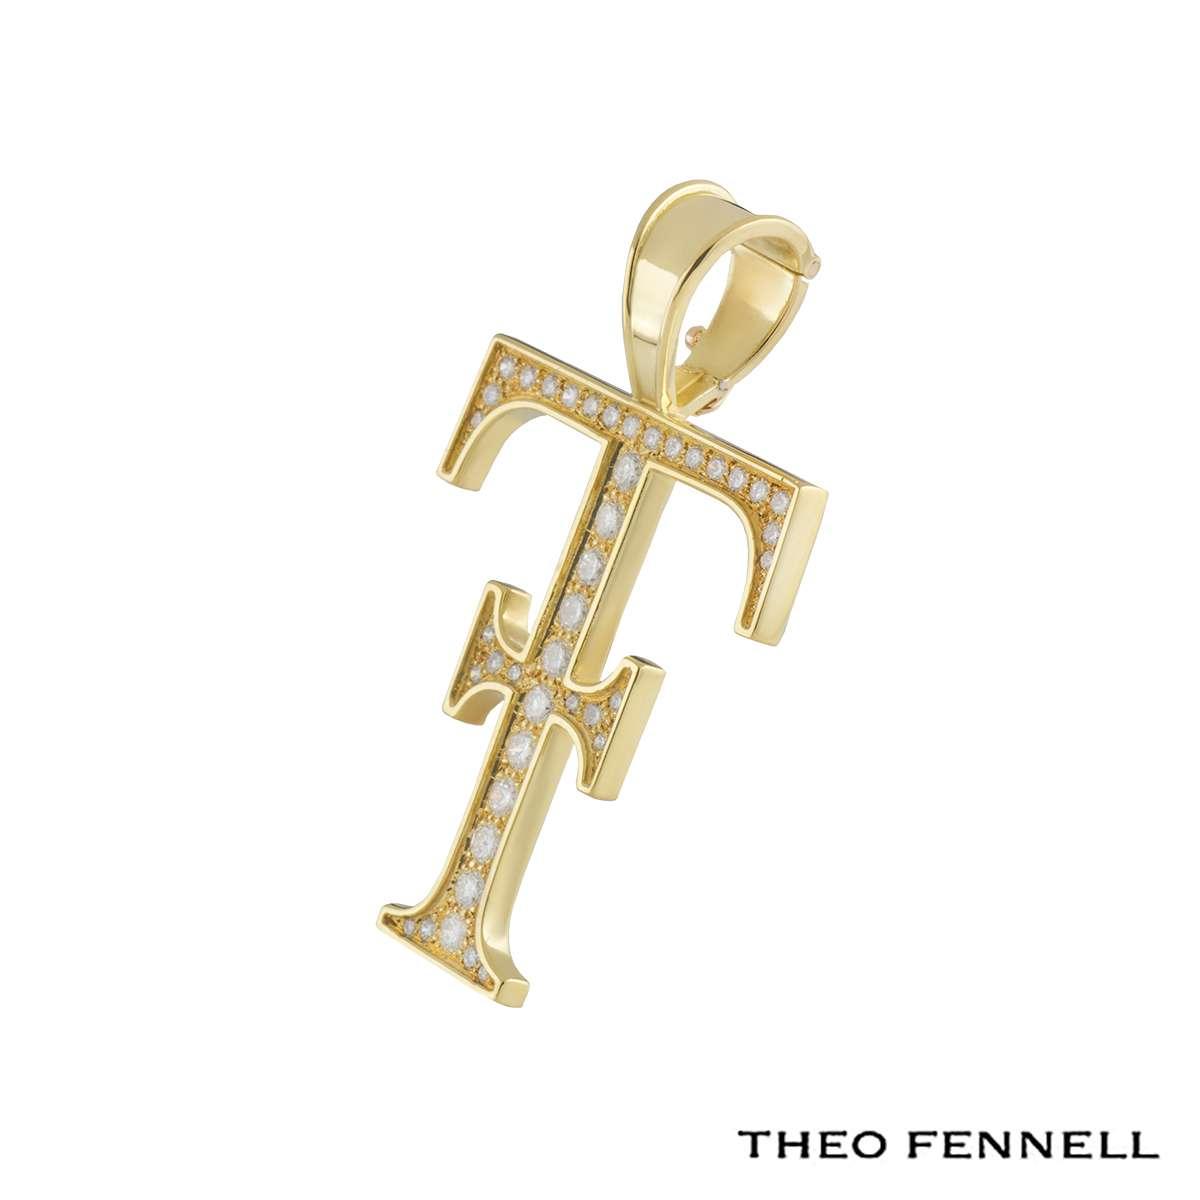 Theo Fennell Logo 18k Yellow Gold Diamond Pendant 1.09ct